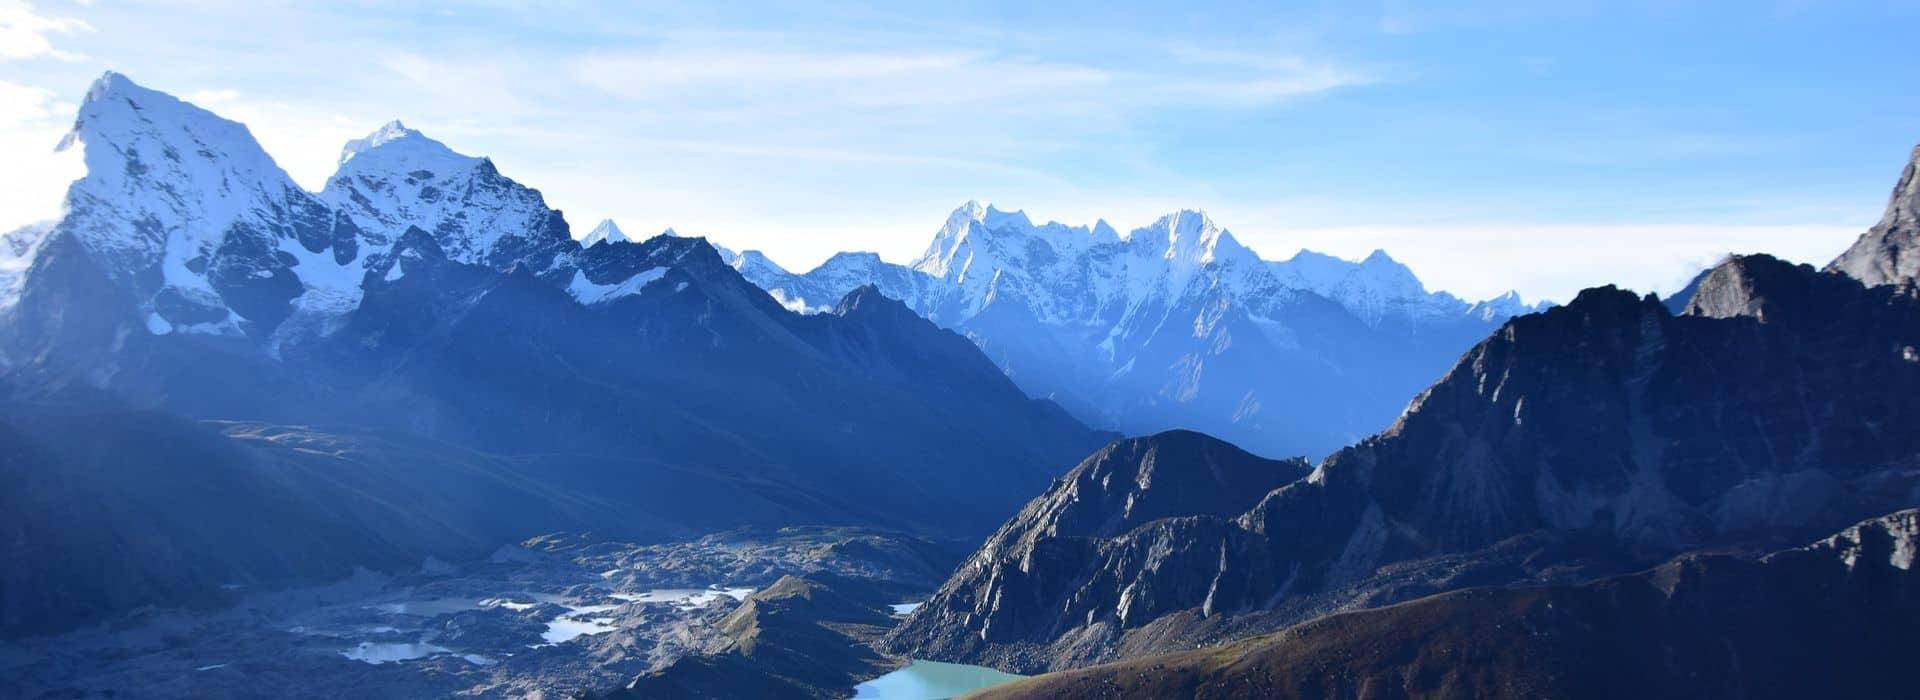 Everest Base Camp Trek Daily Budget